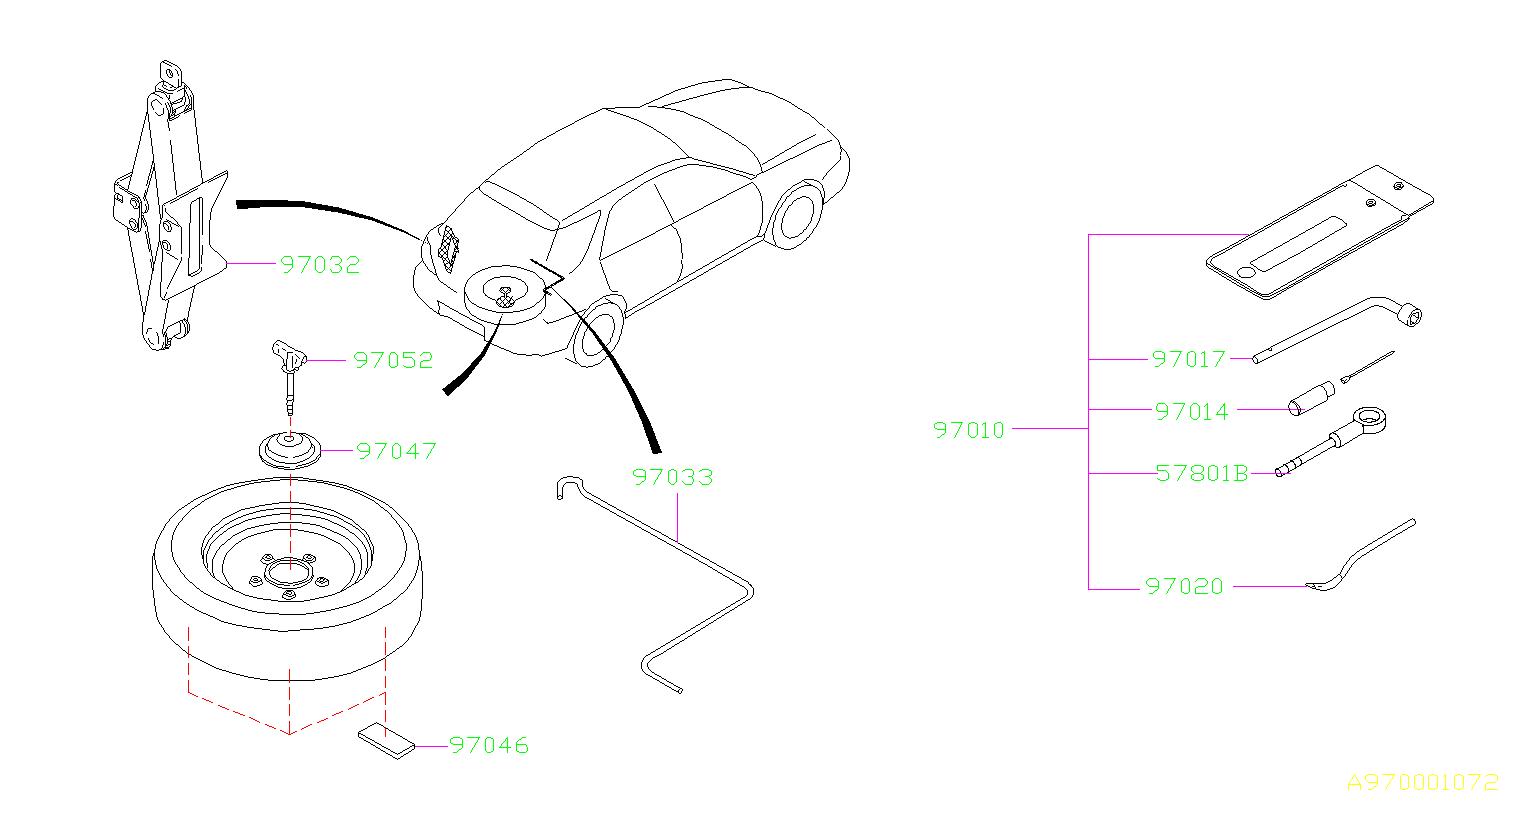 Subaru Wrx Tool Kit Jack